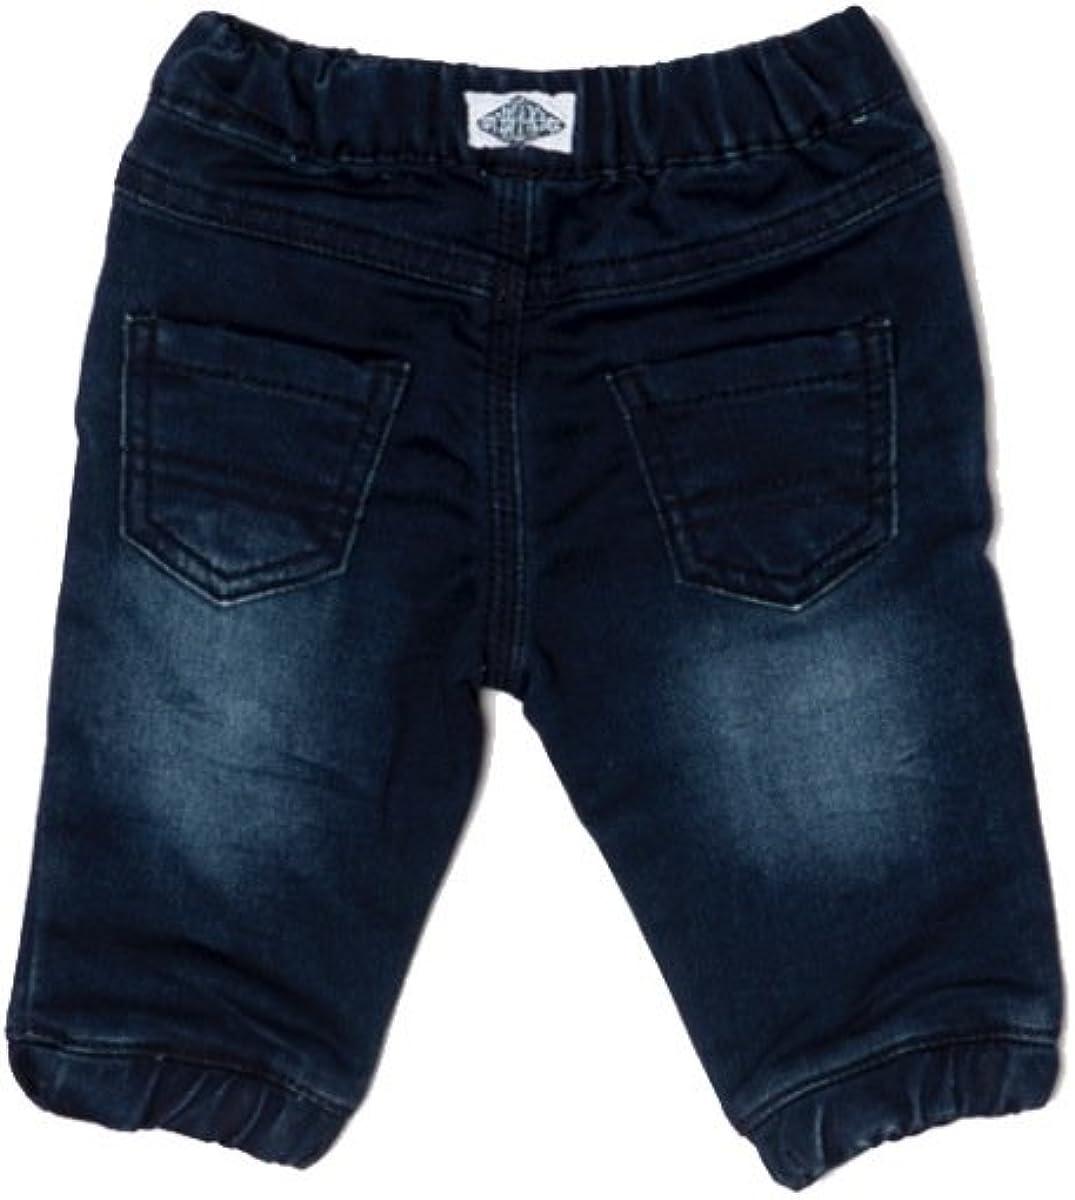 Baby Boys Dark Washed Jog Jeans from Minoti